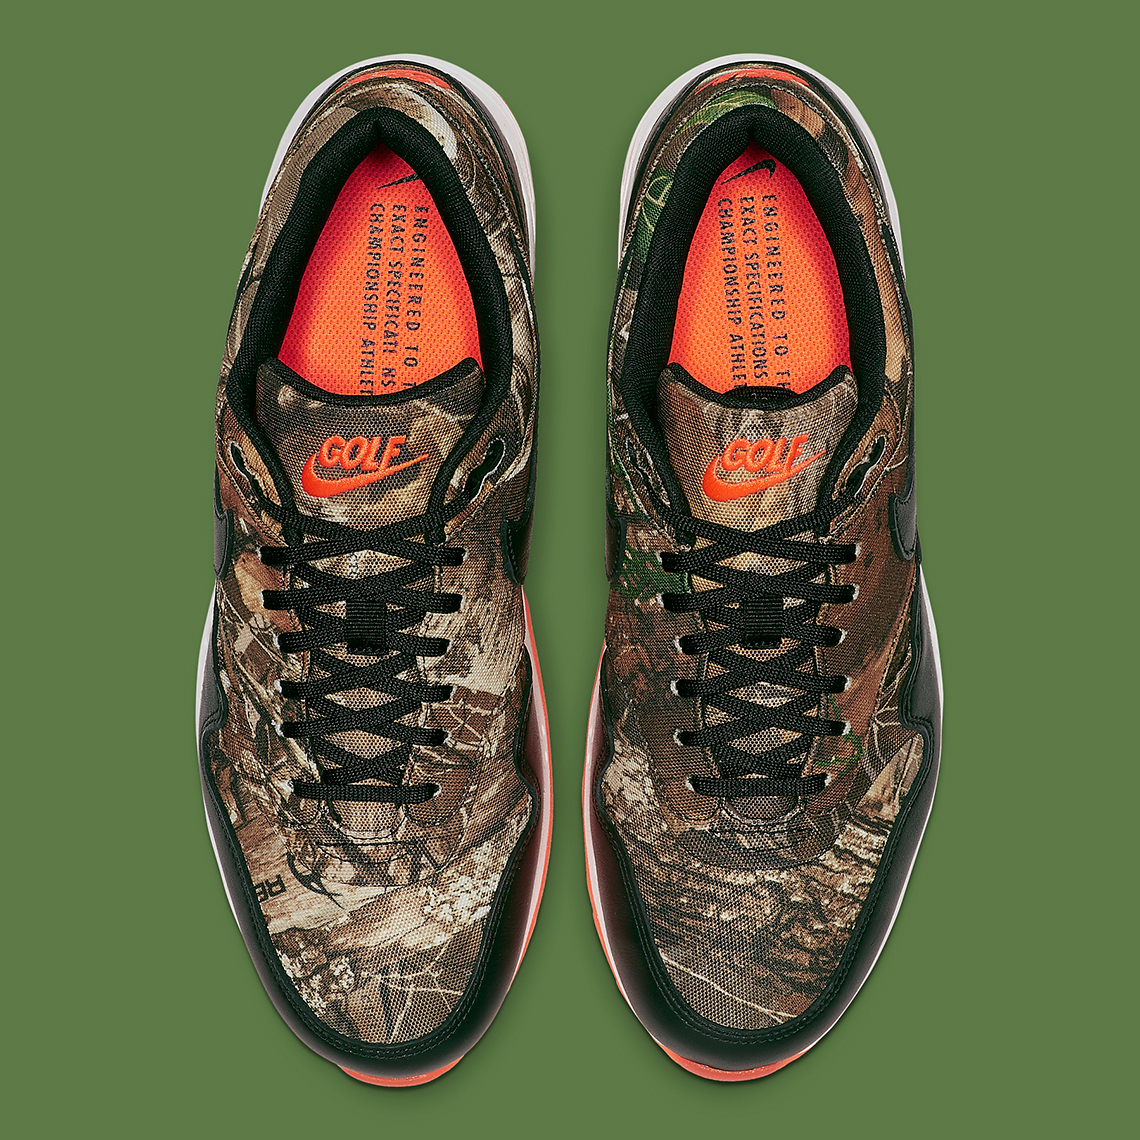 Nike Air Max 1 Golf Realtree Camo BQ4804 210 Release Date